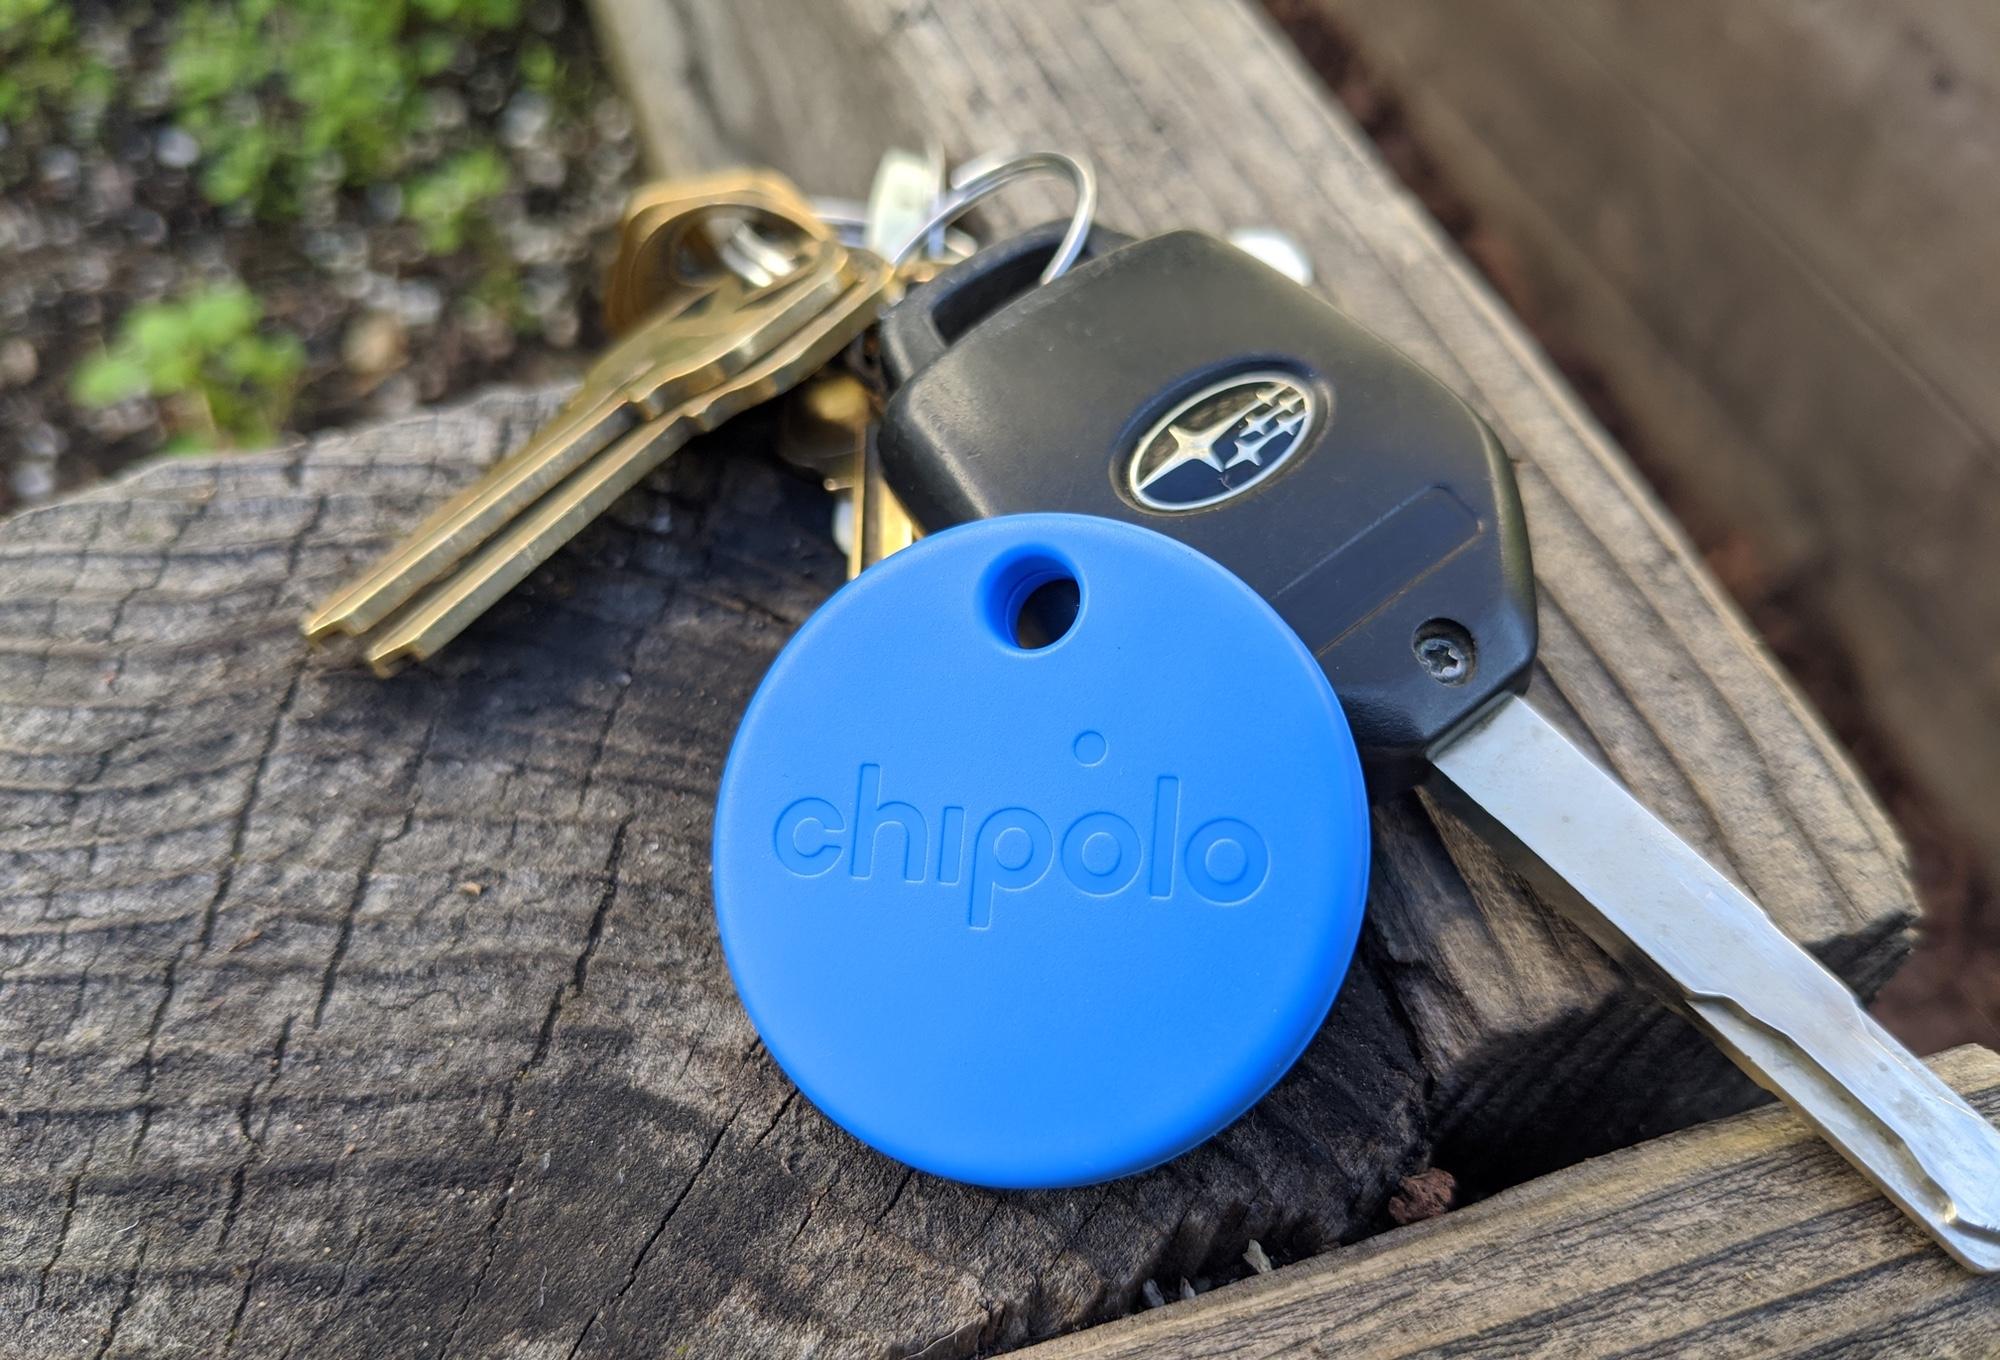 best key finder: Chipolo One key finder